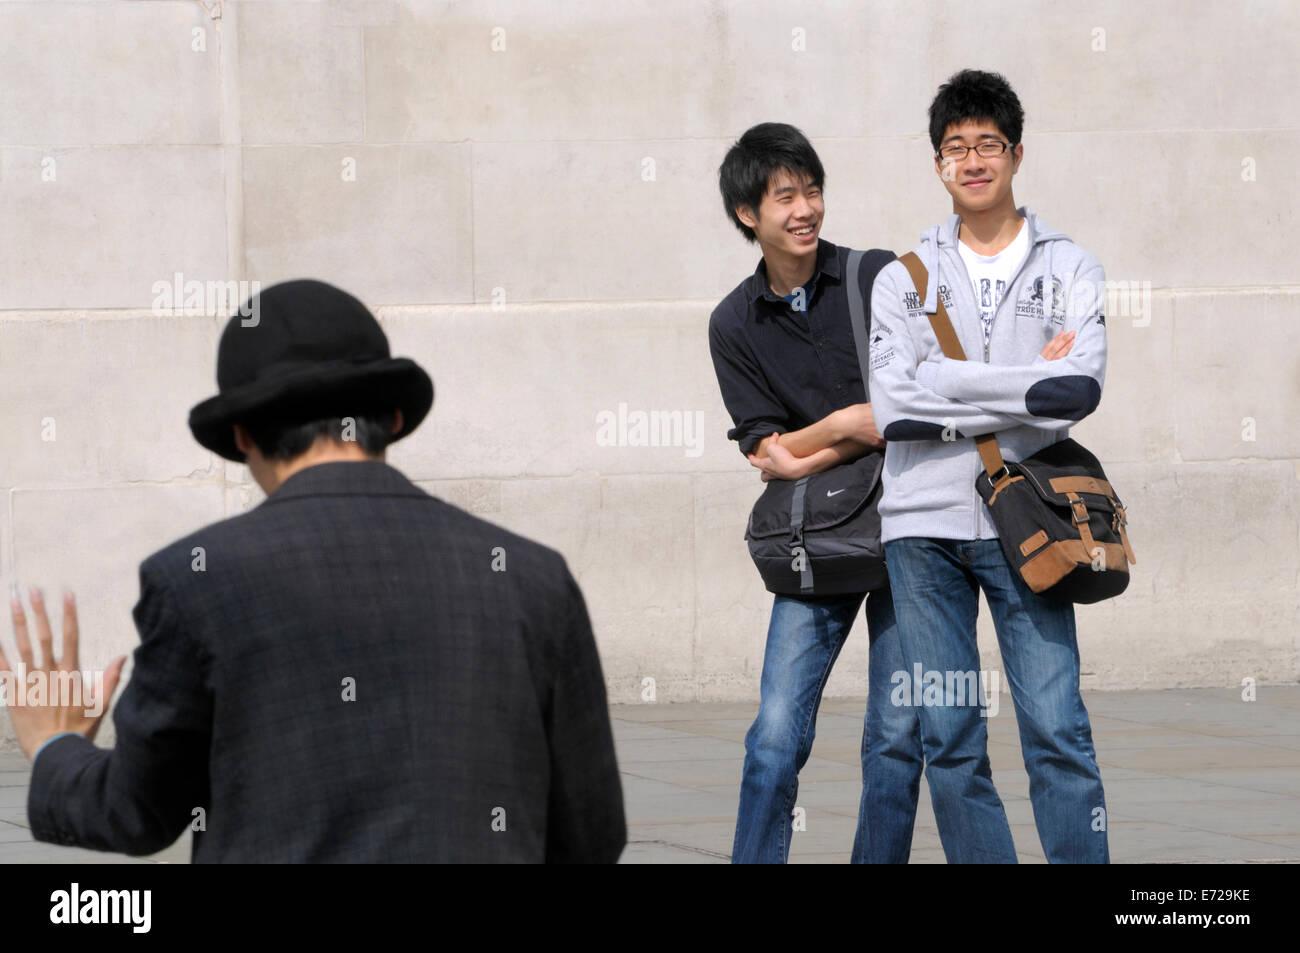 London, England, UK. Japanese tourists watching a mime artist in Trafalgar Square - Stock Image